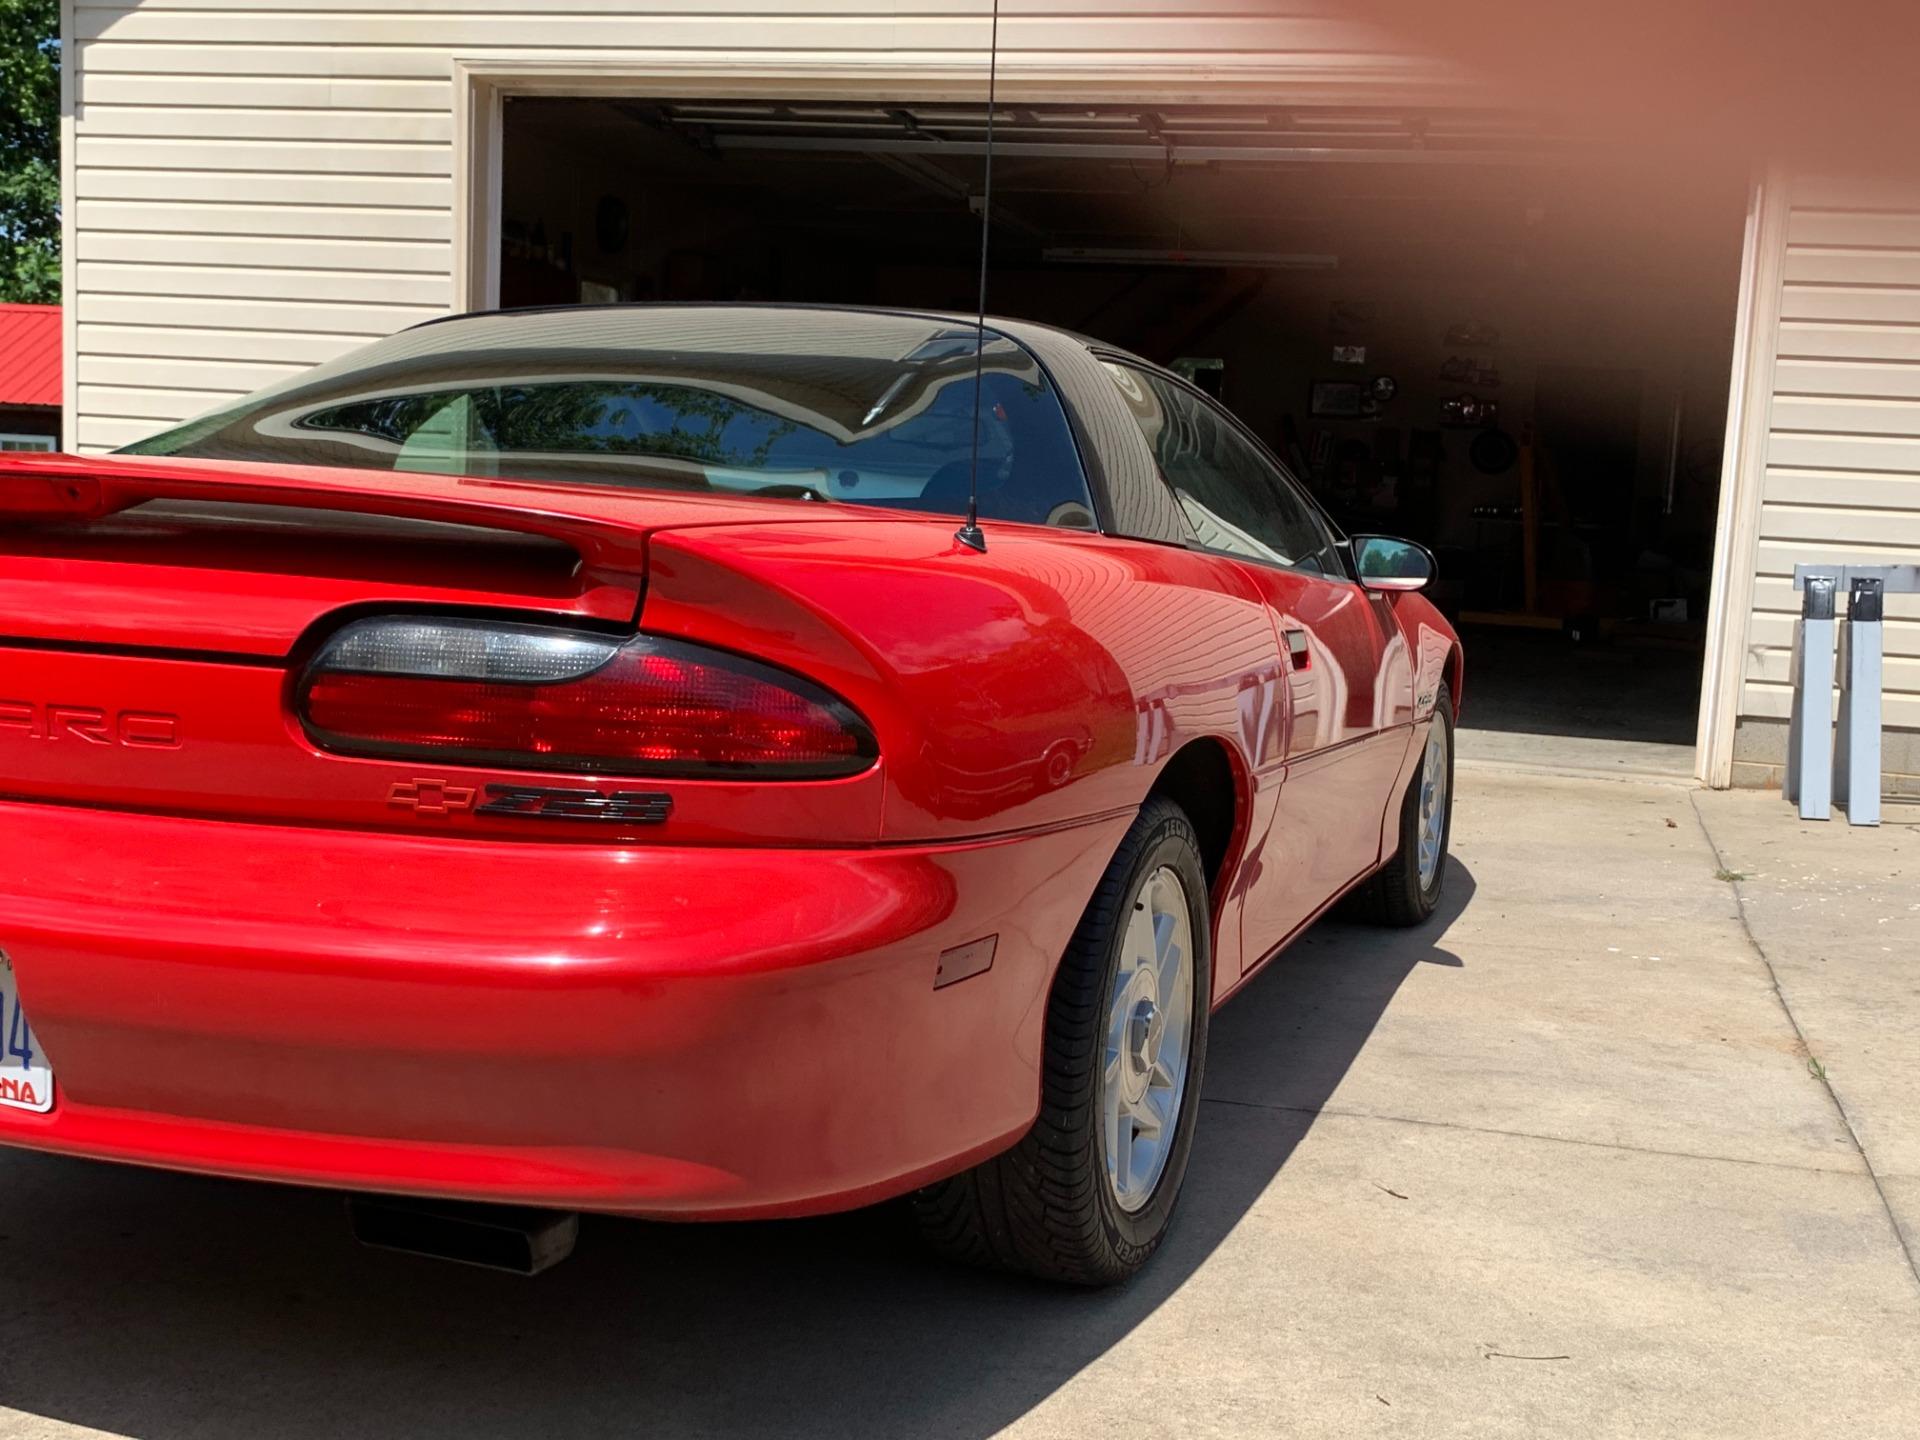 New 1994 Chevrolet Camaro Z28